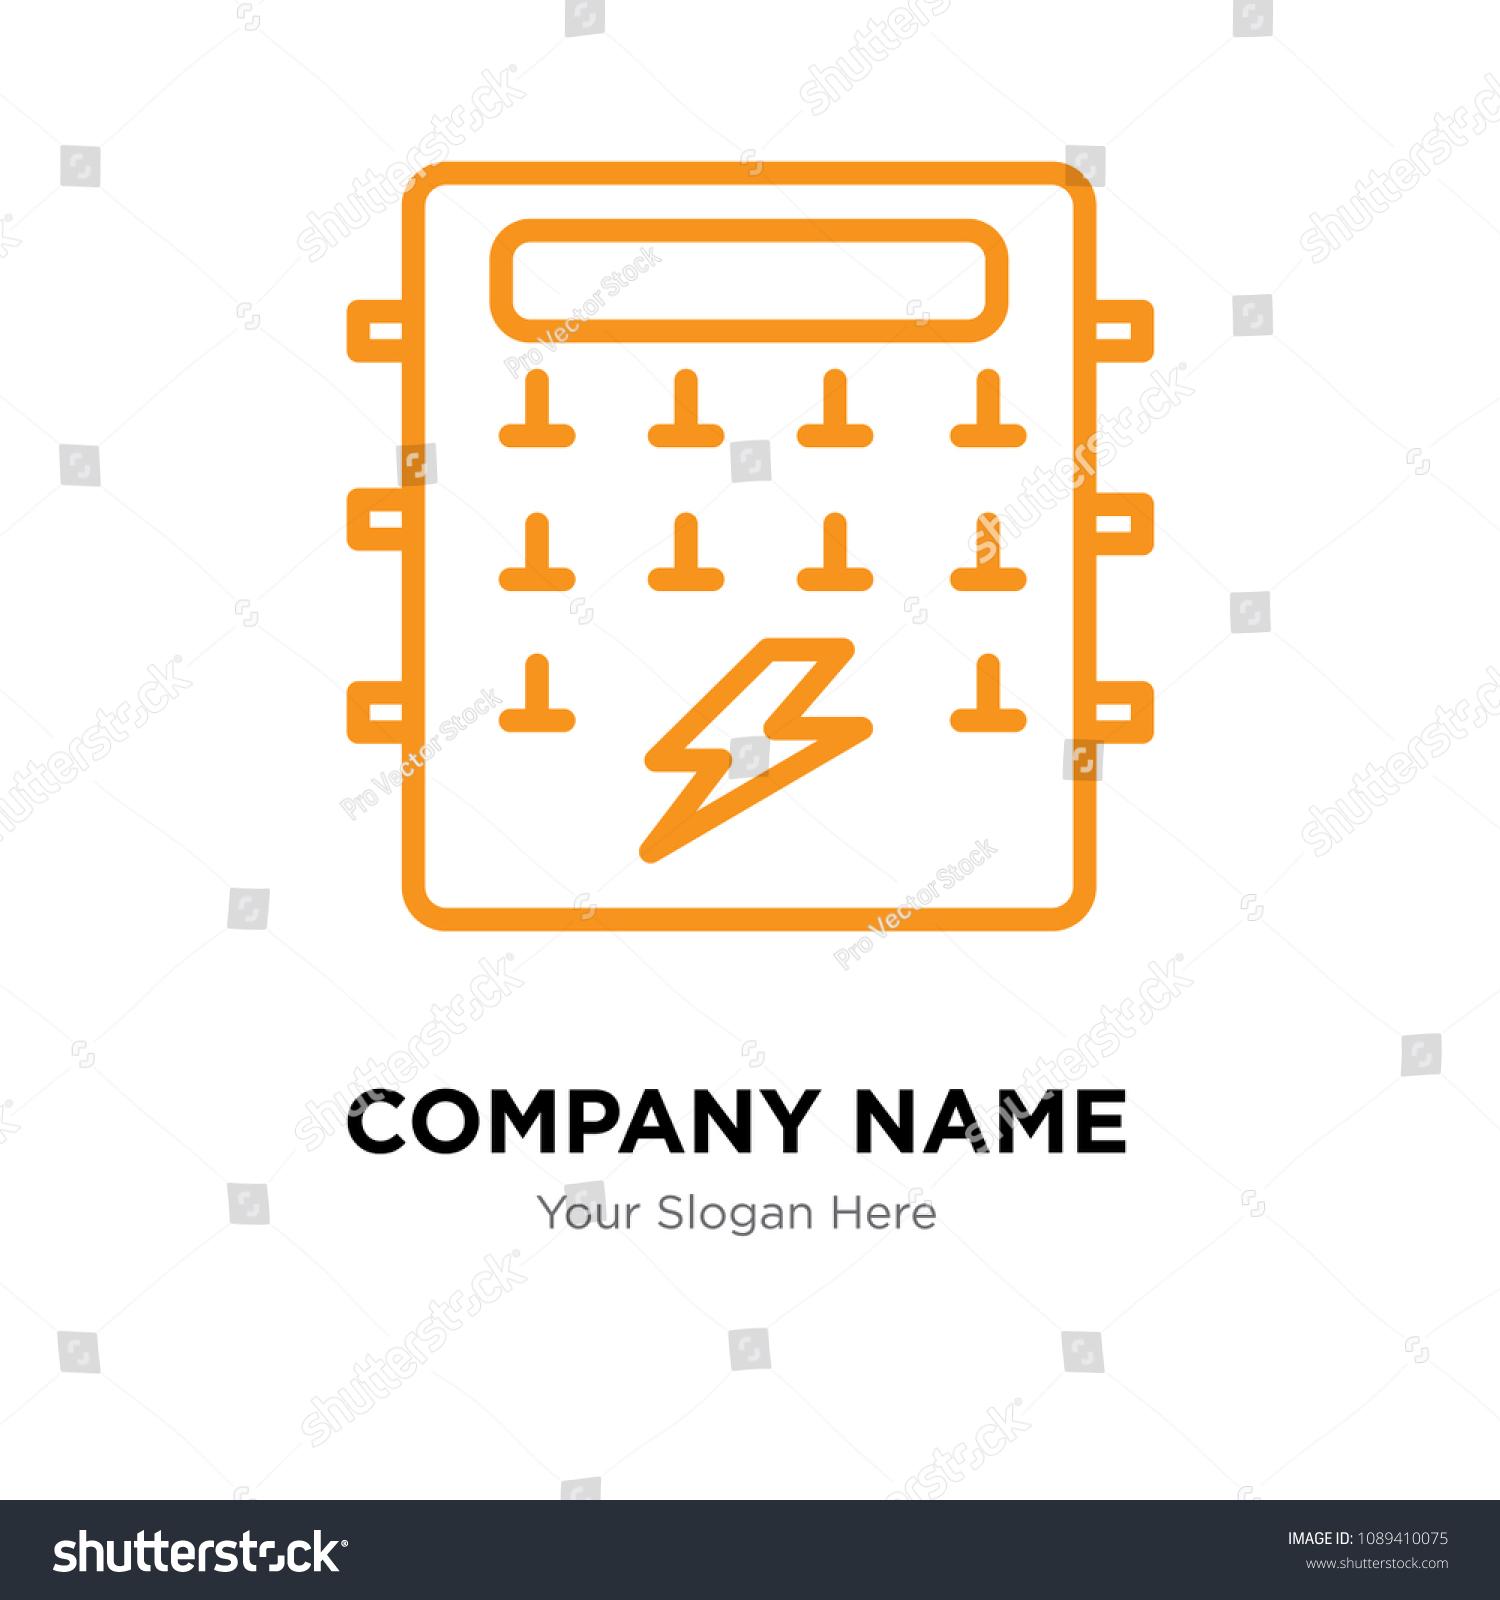 hight resolution of fuse box company logo design template business corporate vector icon fuse box symbol